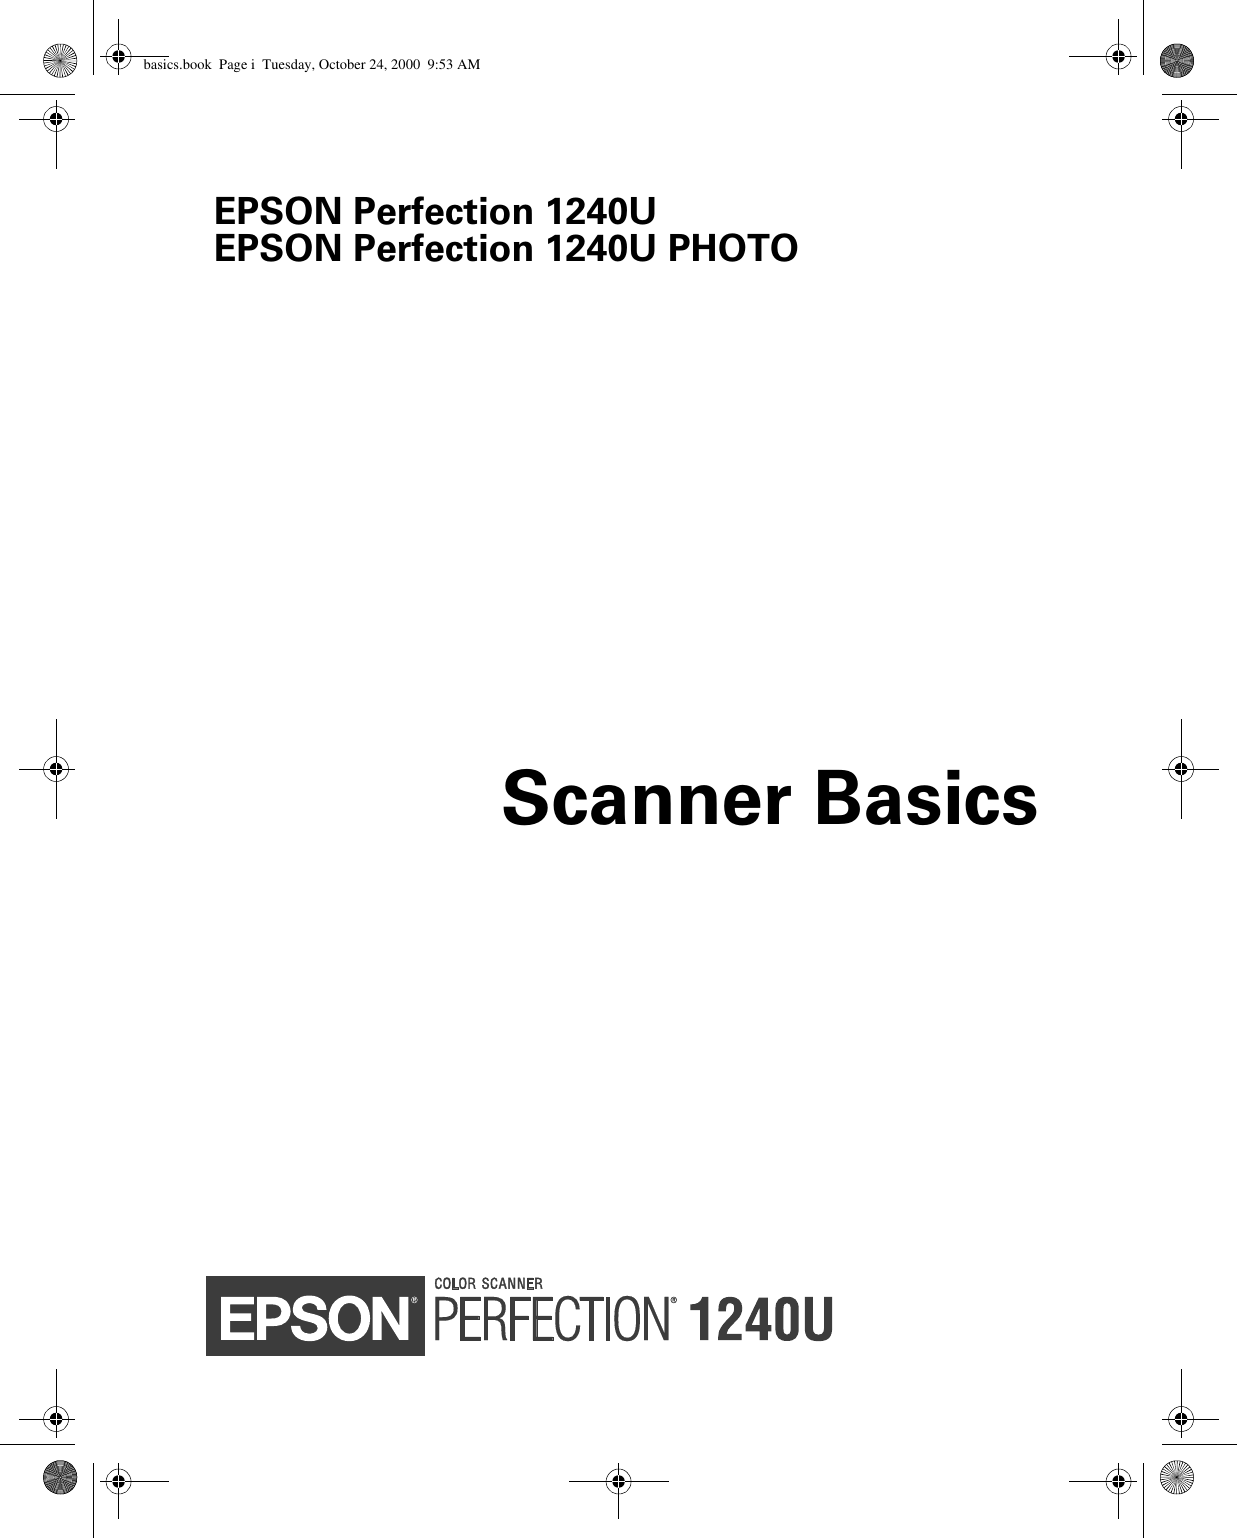 EPSON PERFECTION 1240U PHOTO ICA SCANNER TREIBER WINDOWS 10